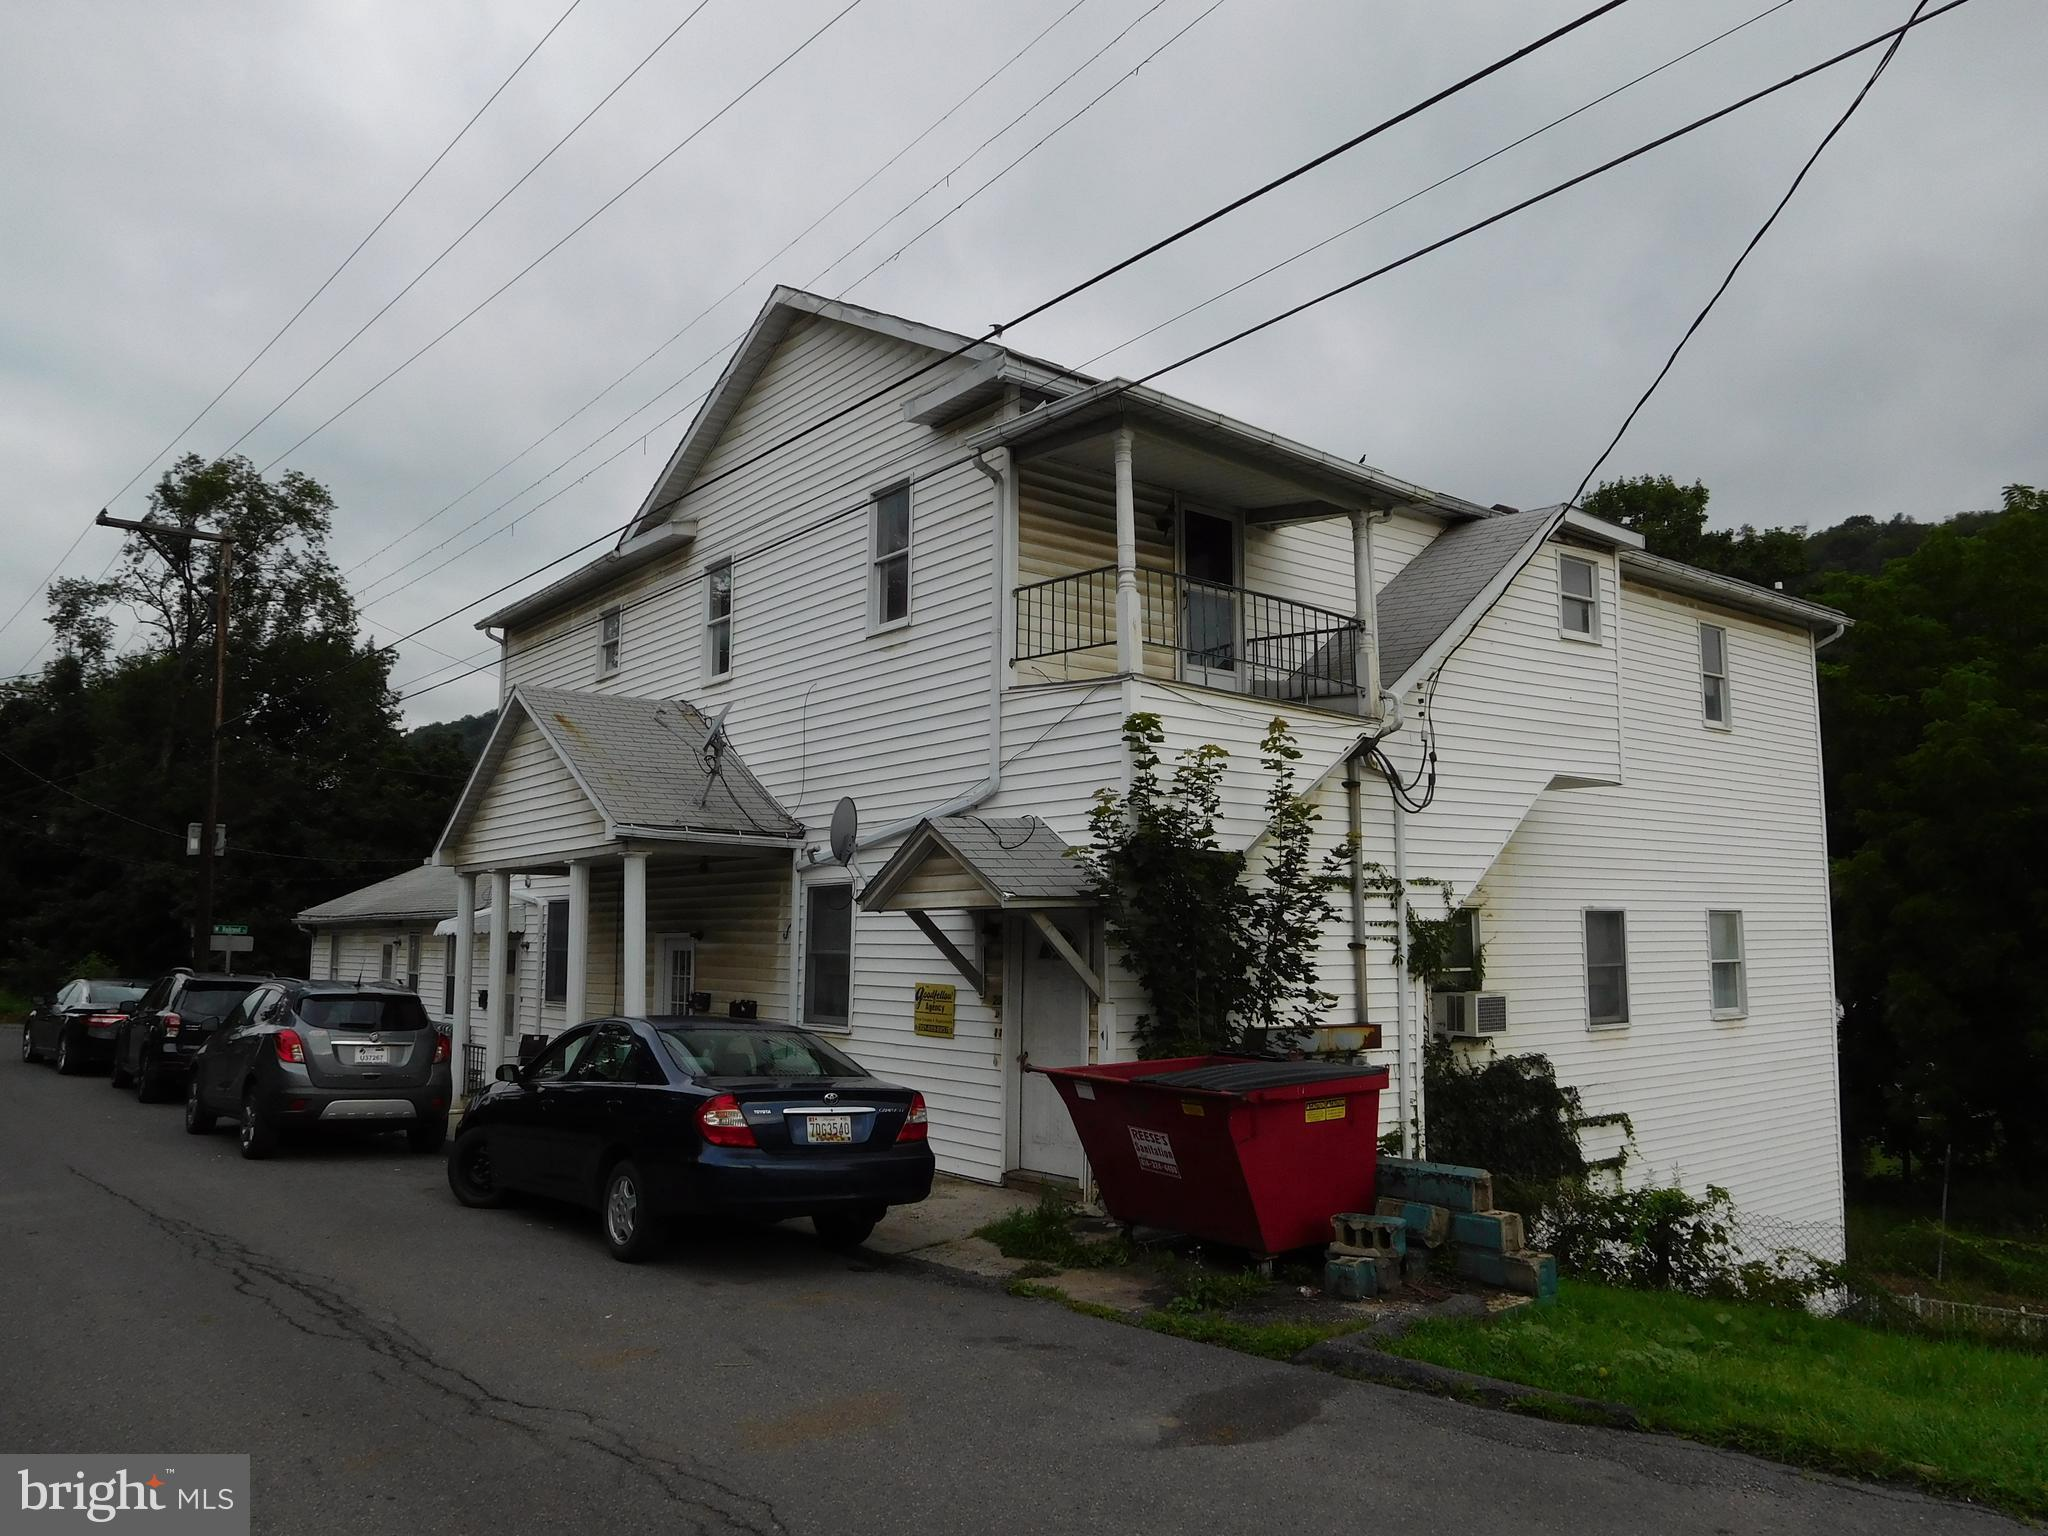 20 FRONT STREET, LONACONING, MD 21539